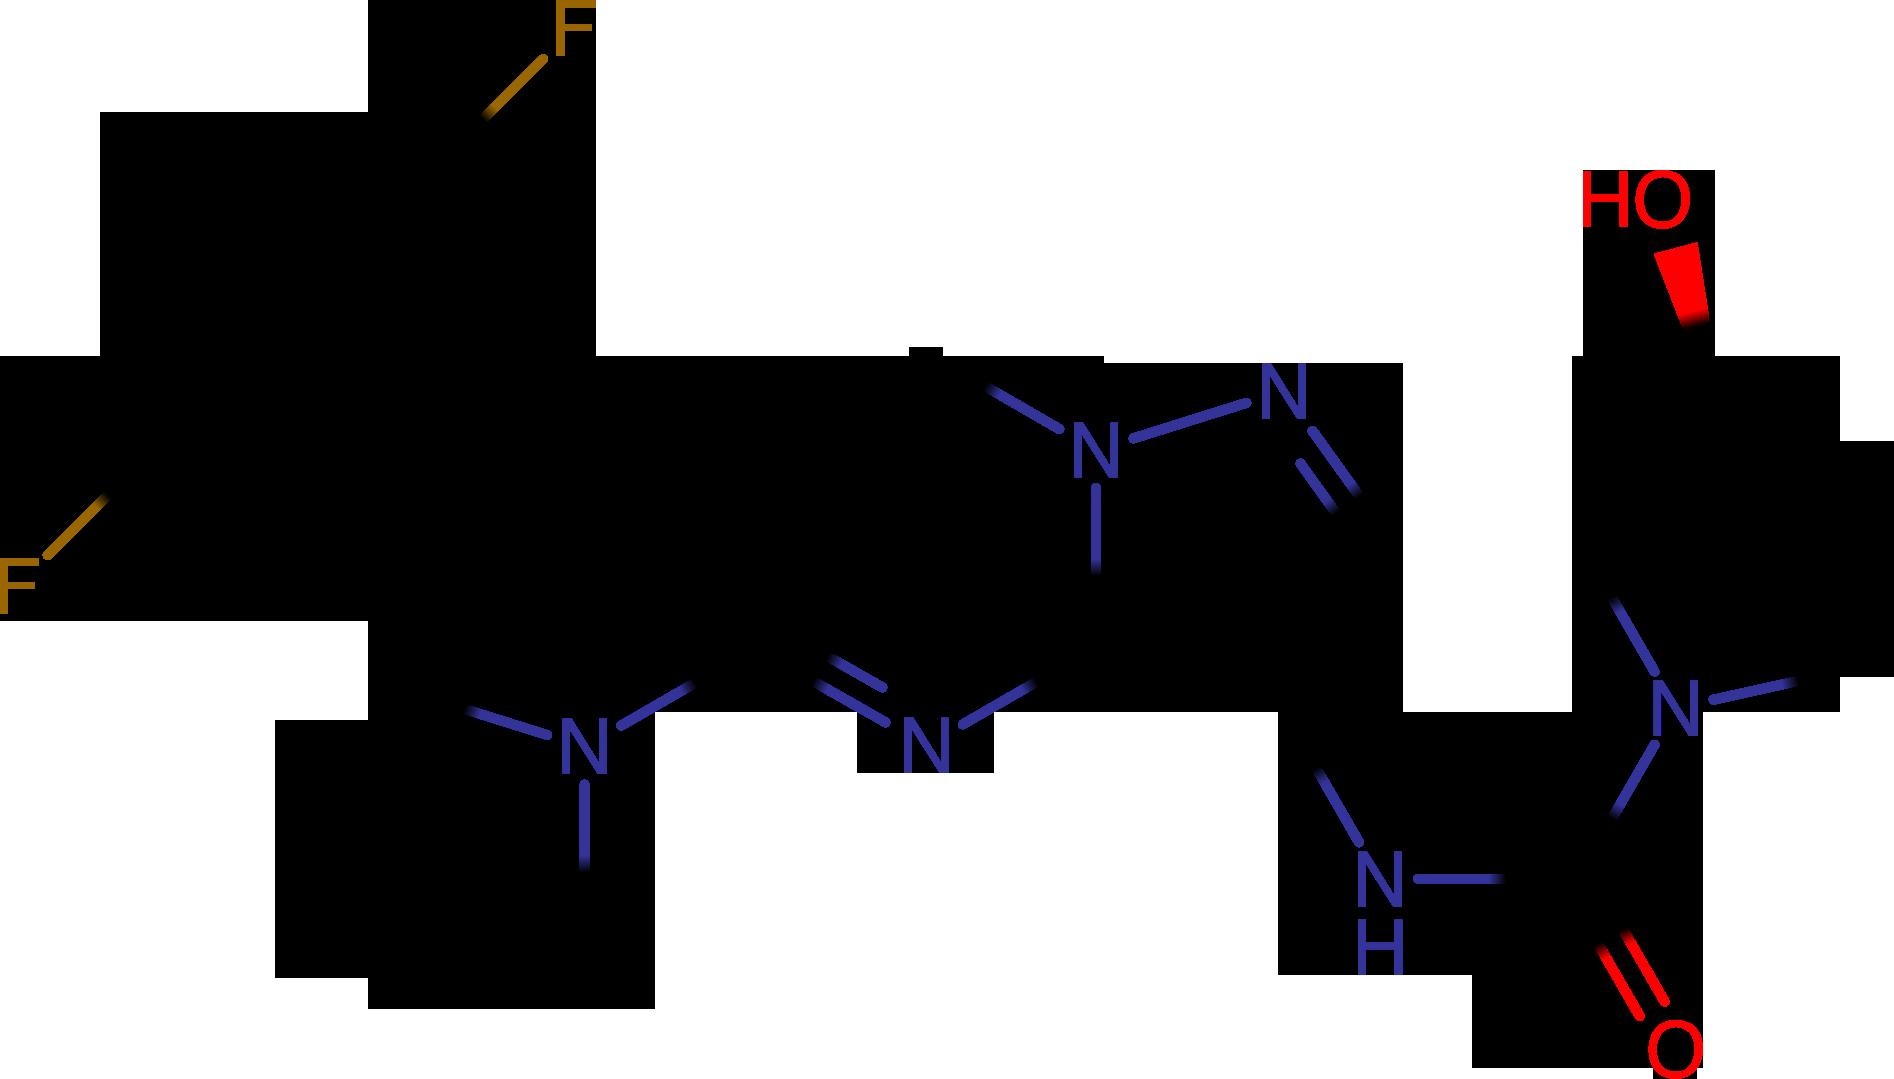 Ларотректиниб (larotrectinib).